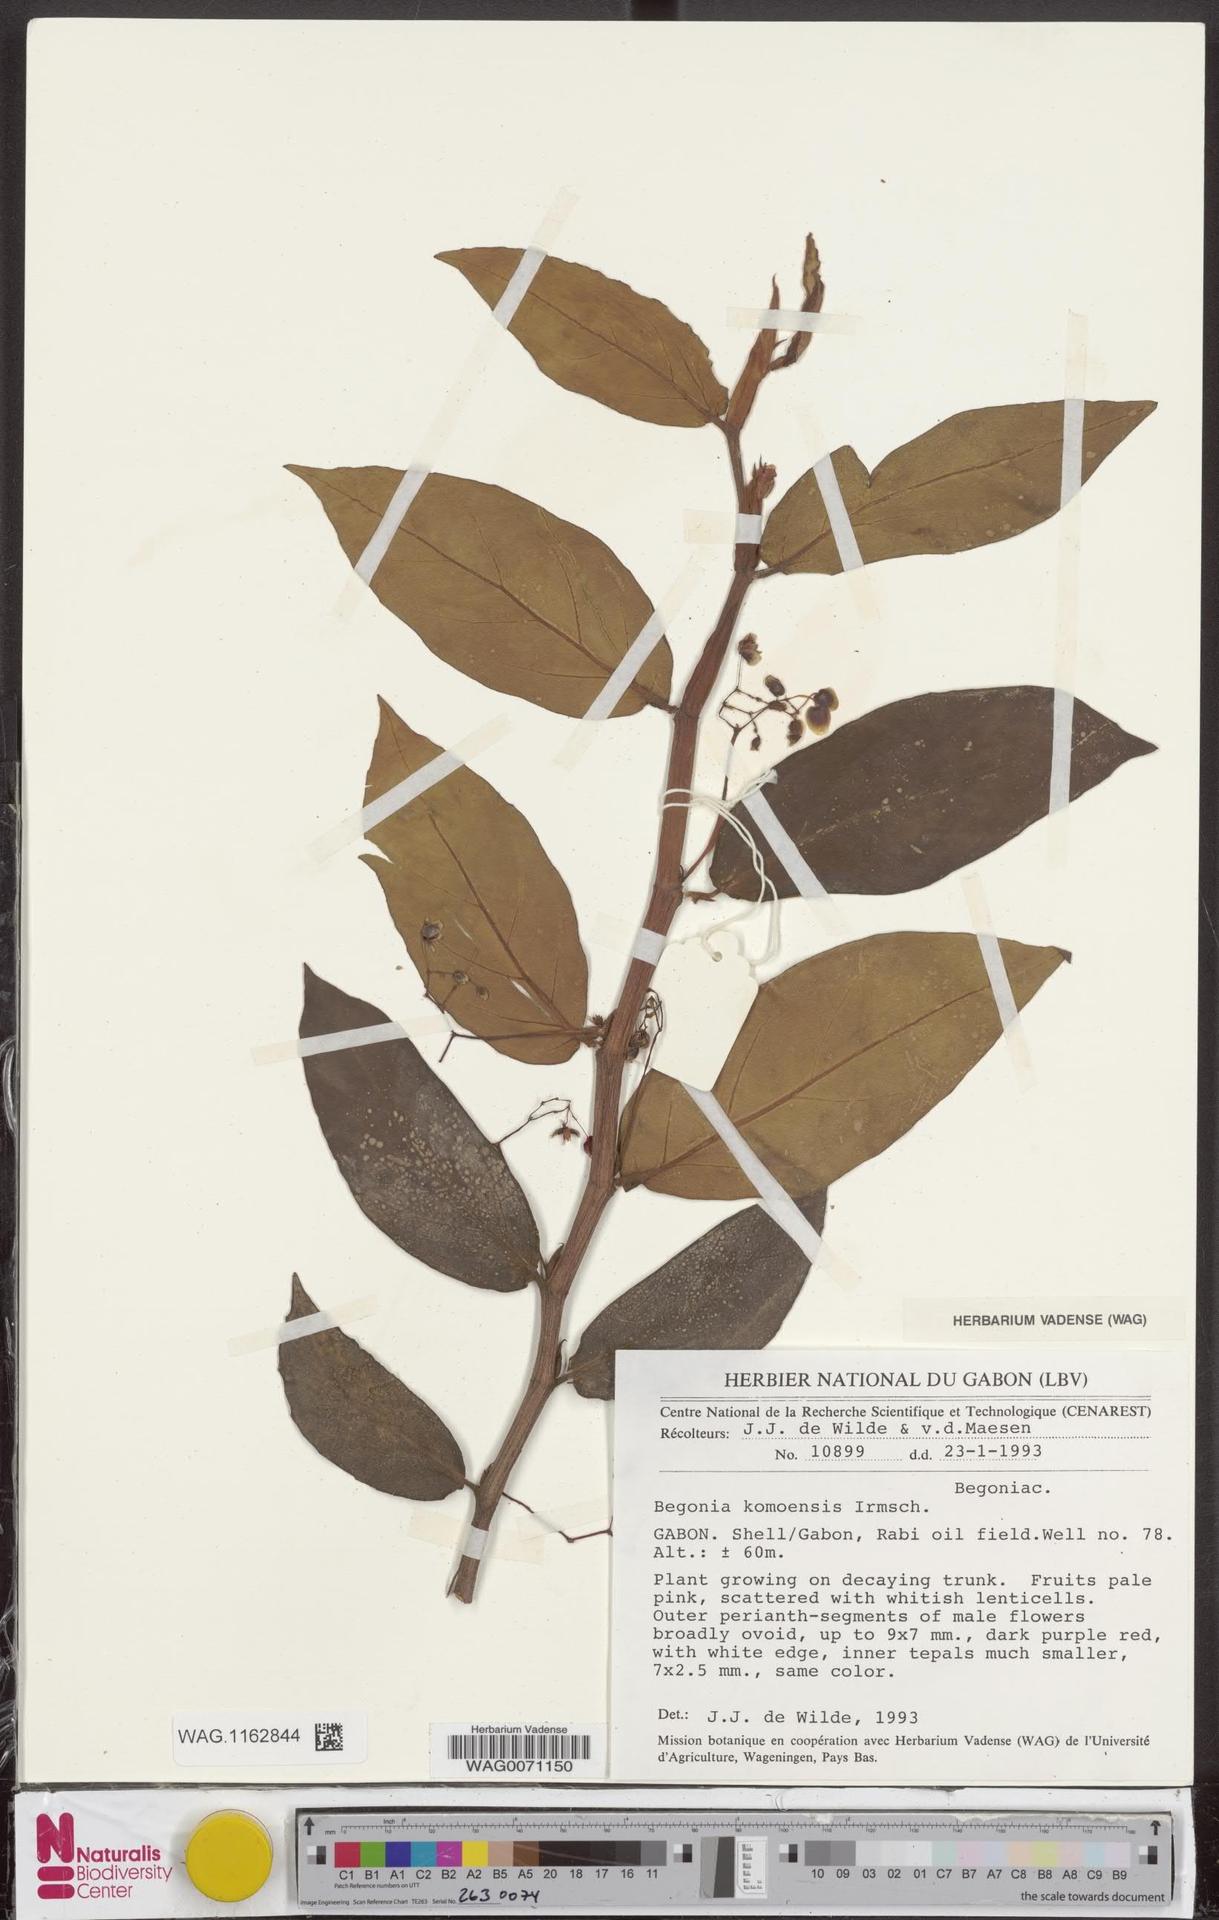 WAG.1162844   Begonia komoensis Irmsch.